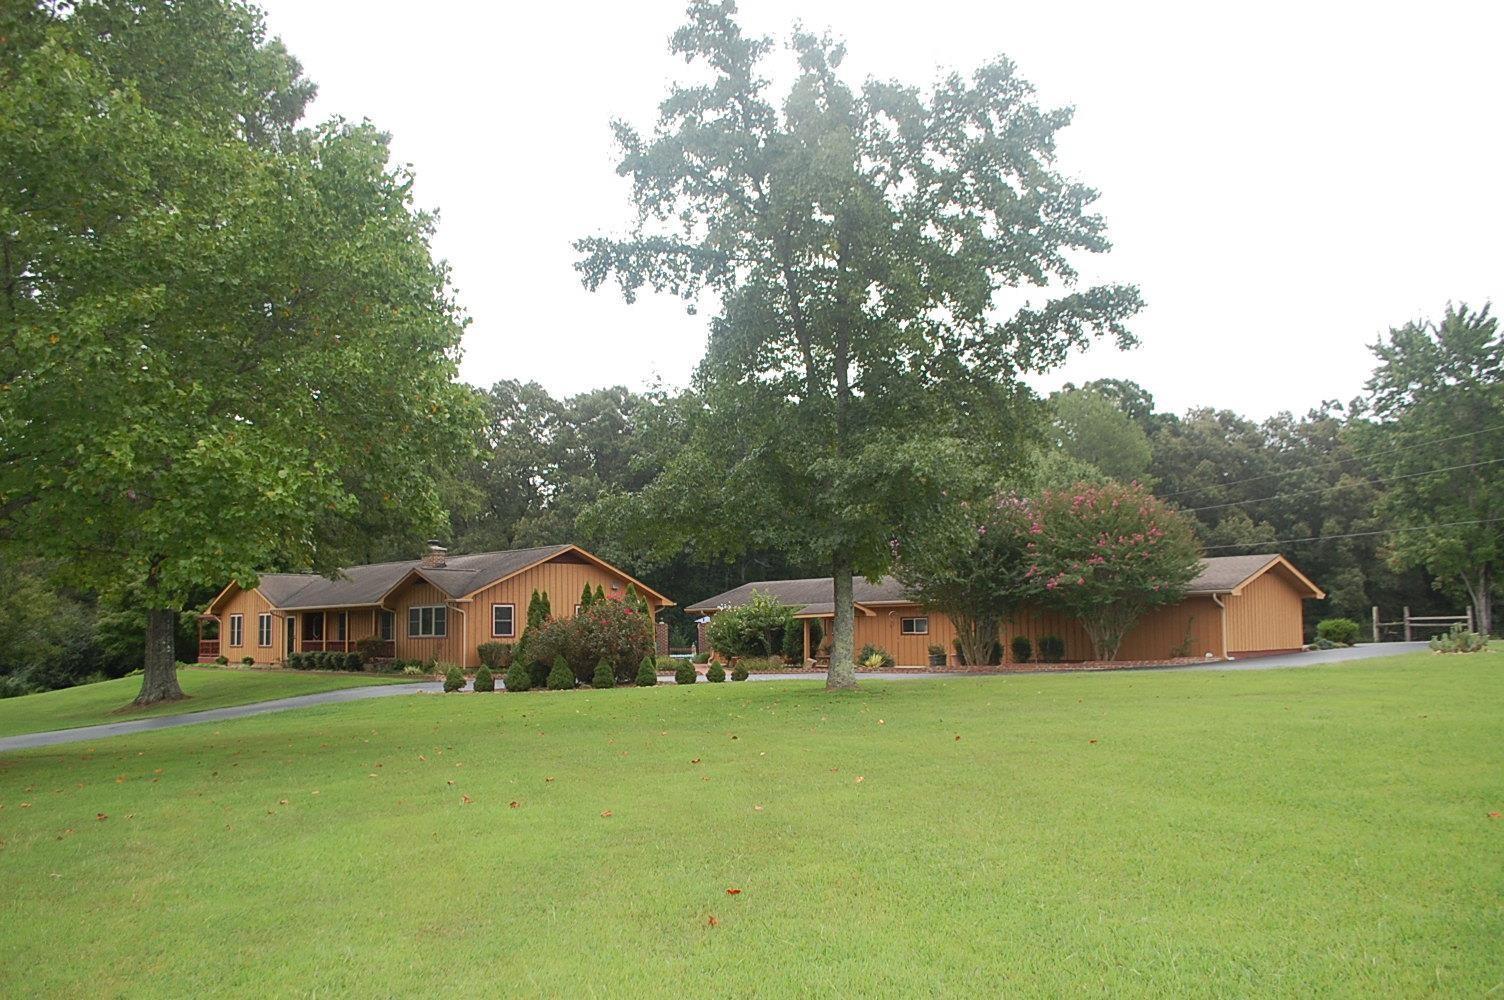 560 Parkway Rd, Tullahoma, TN 37388 - Tullahoma, TN real estate listing